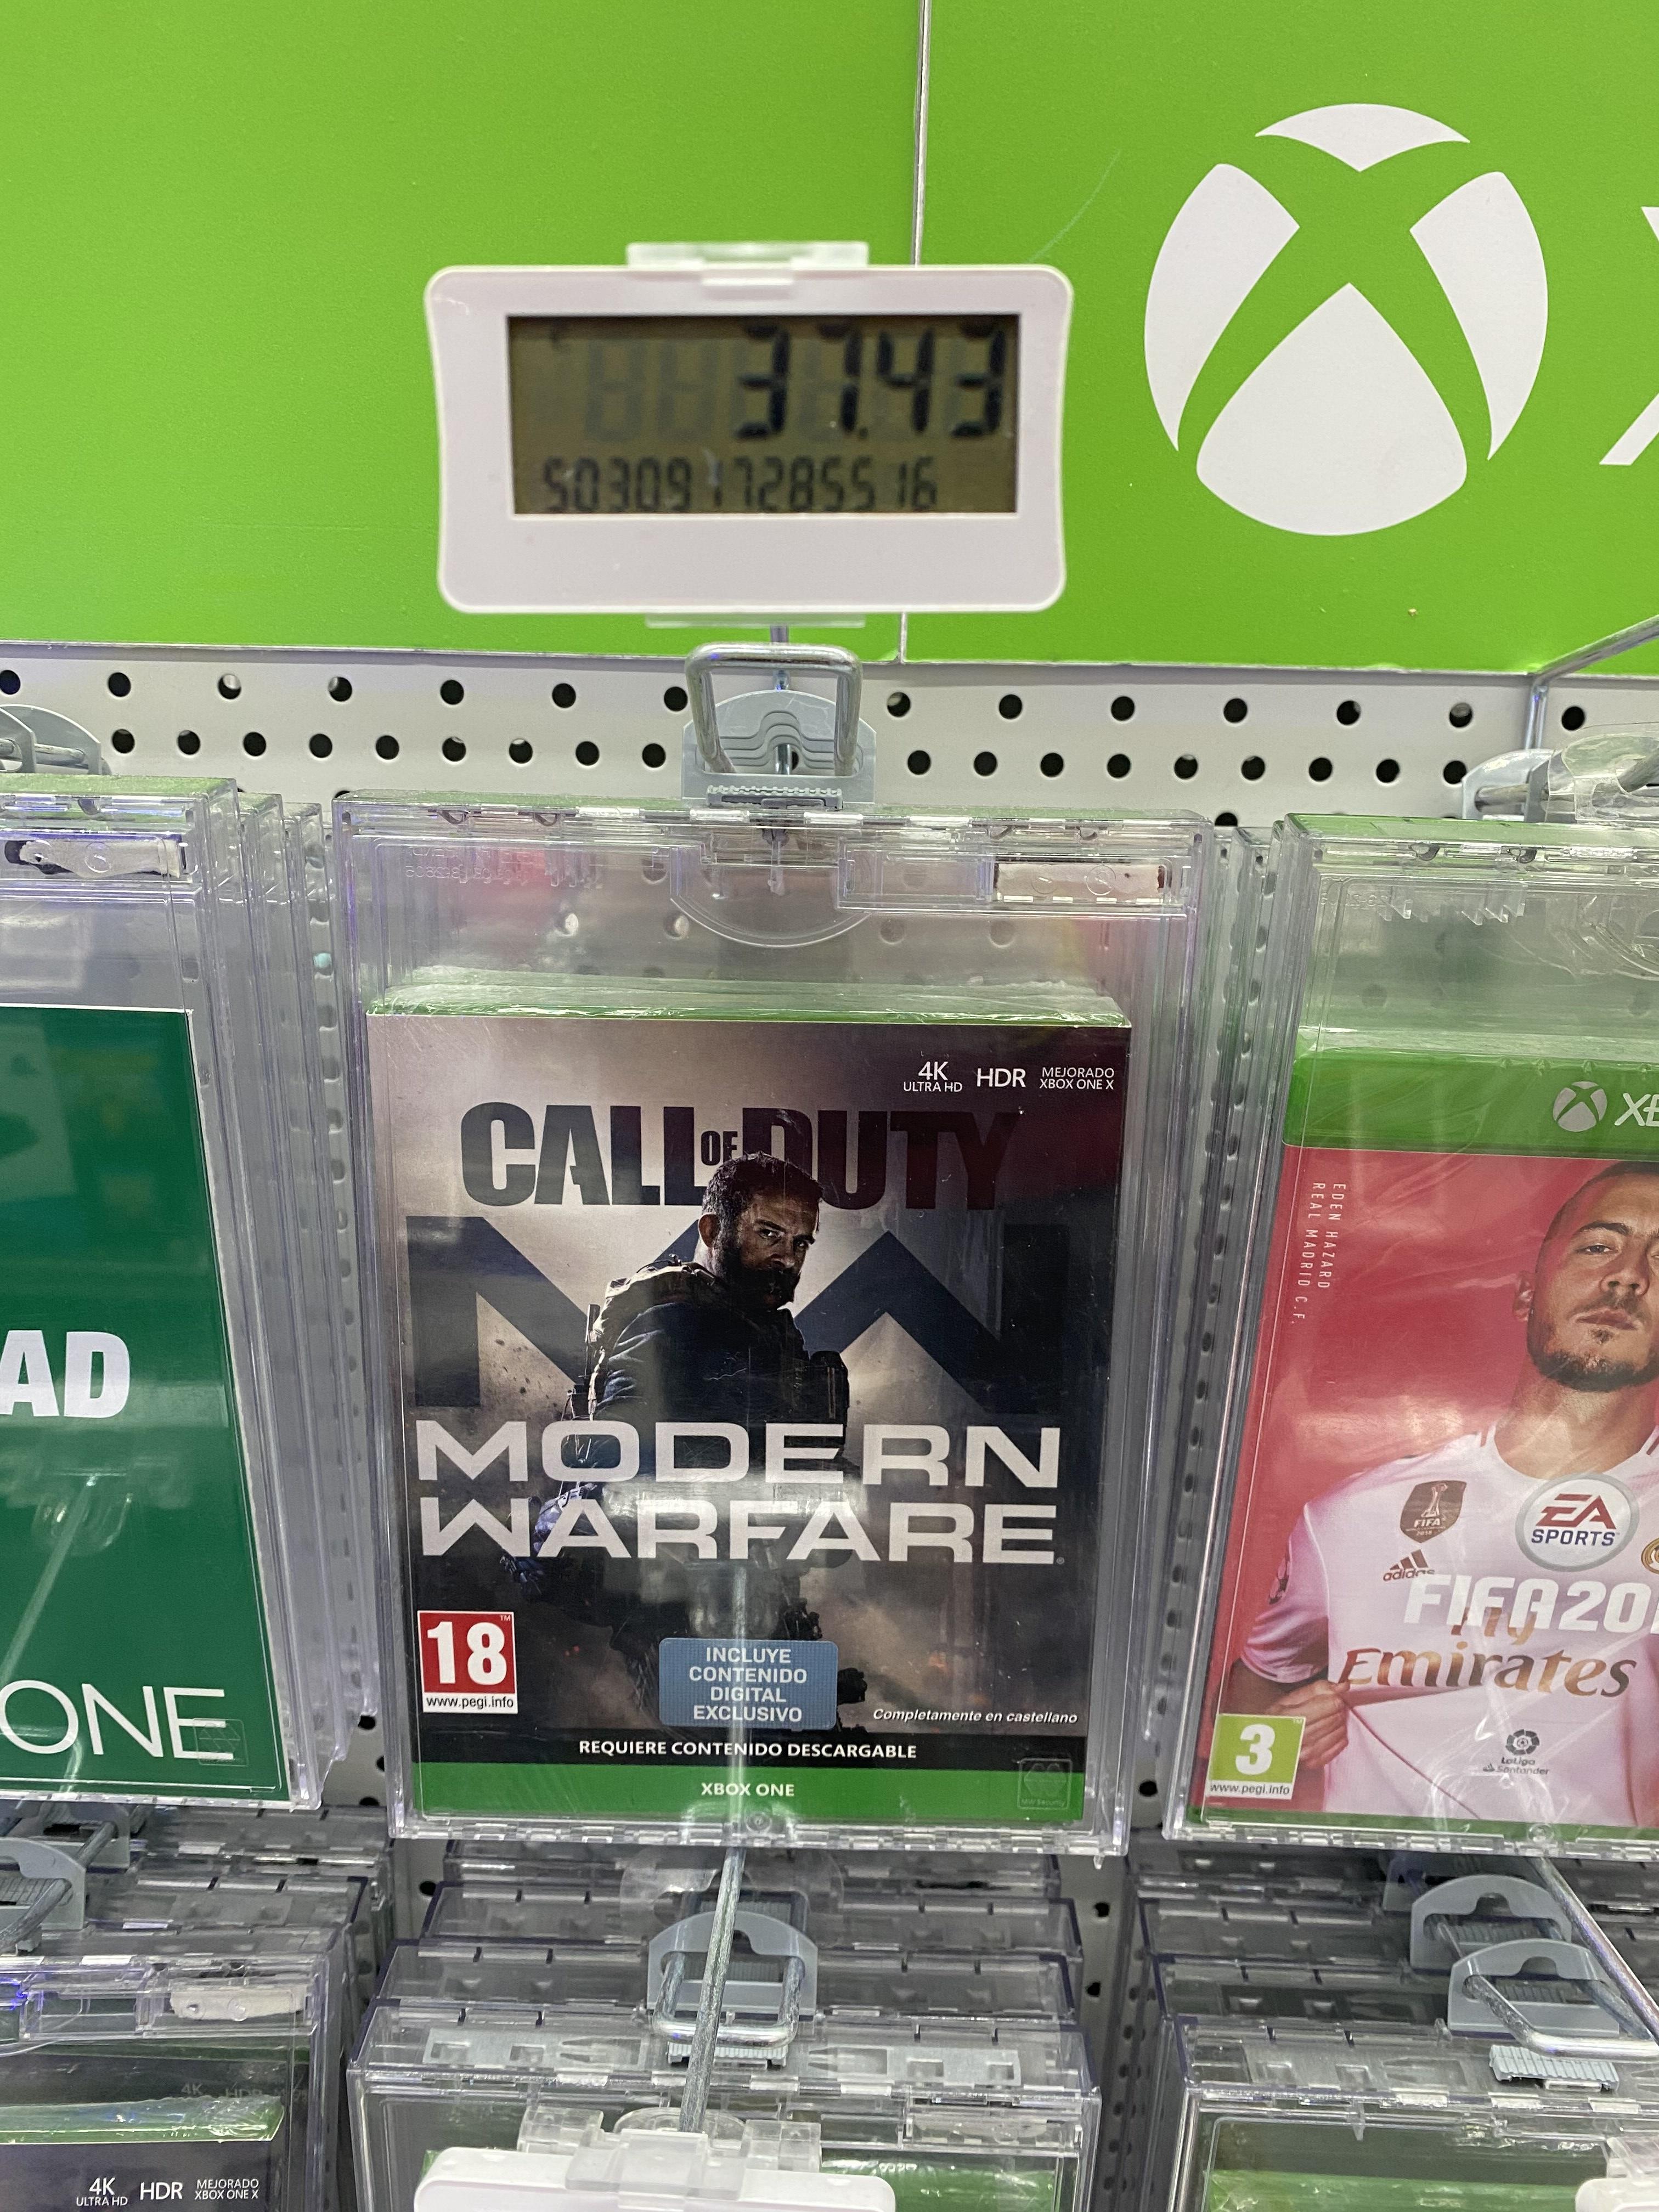 Call of Duty: Modern Warfare (S. de Compostela)